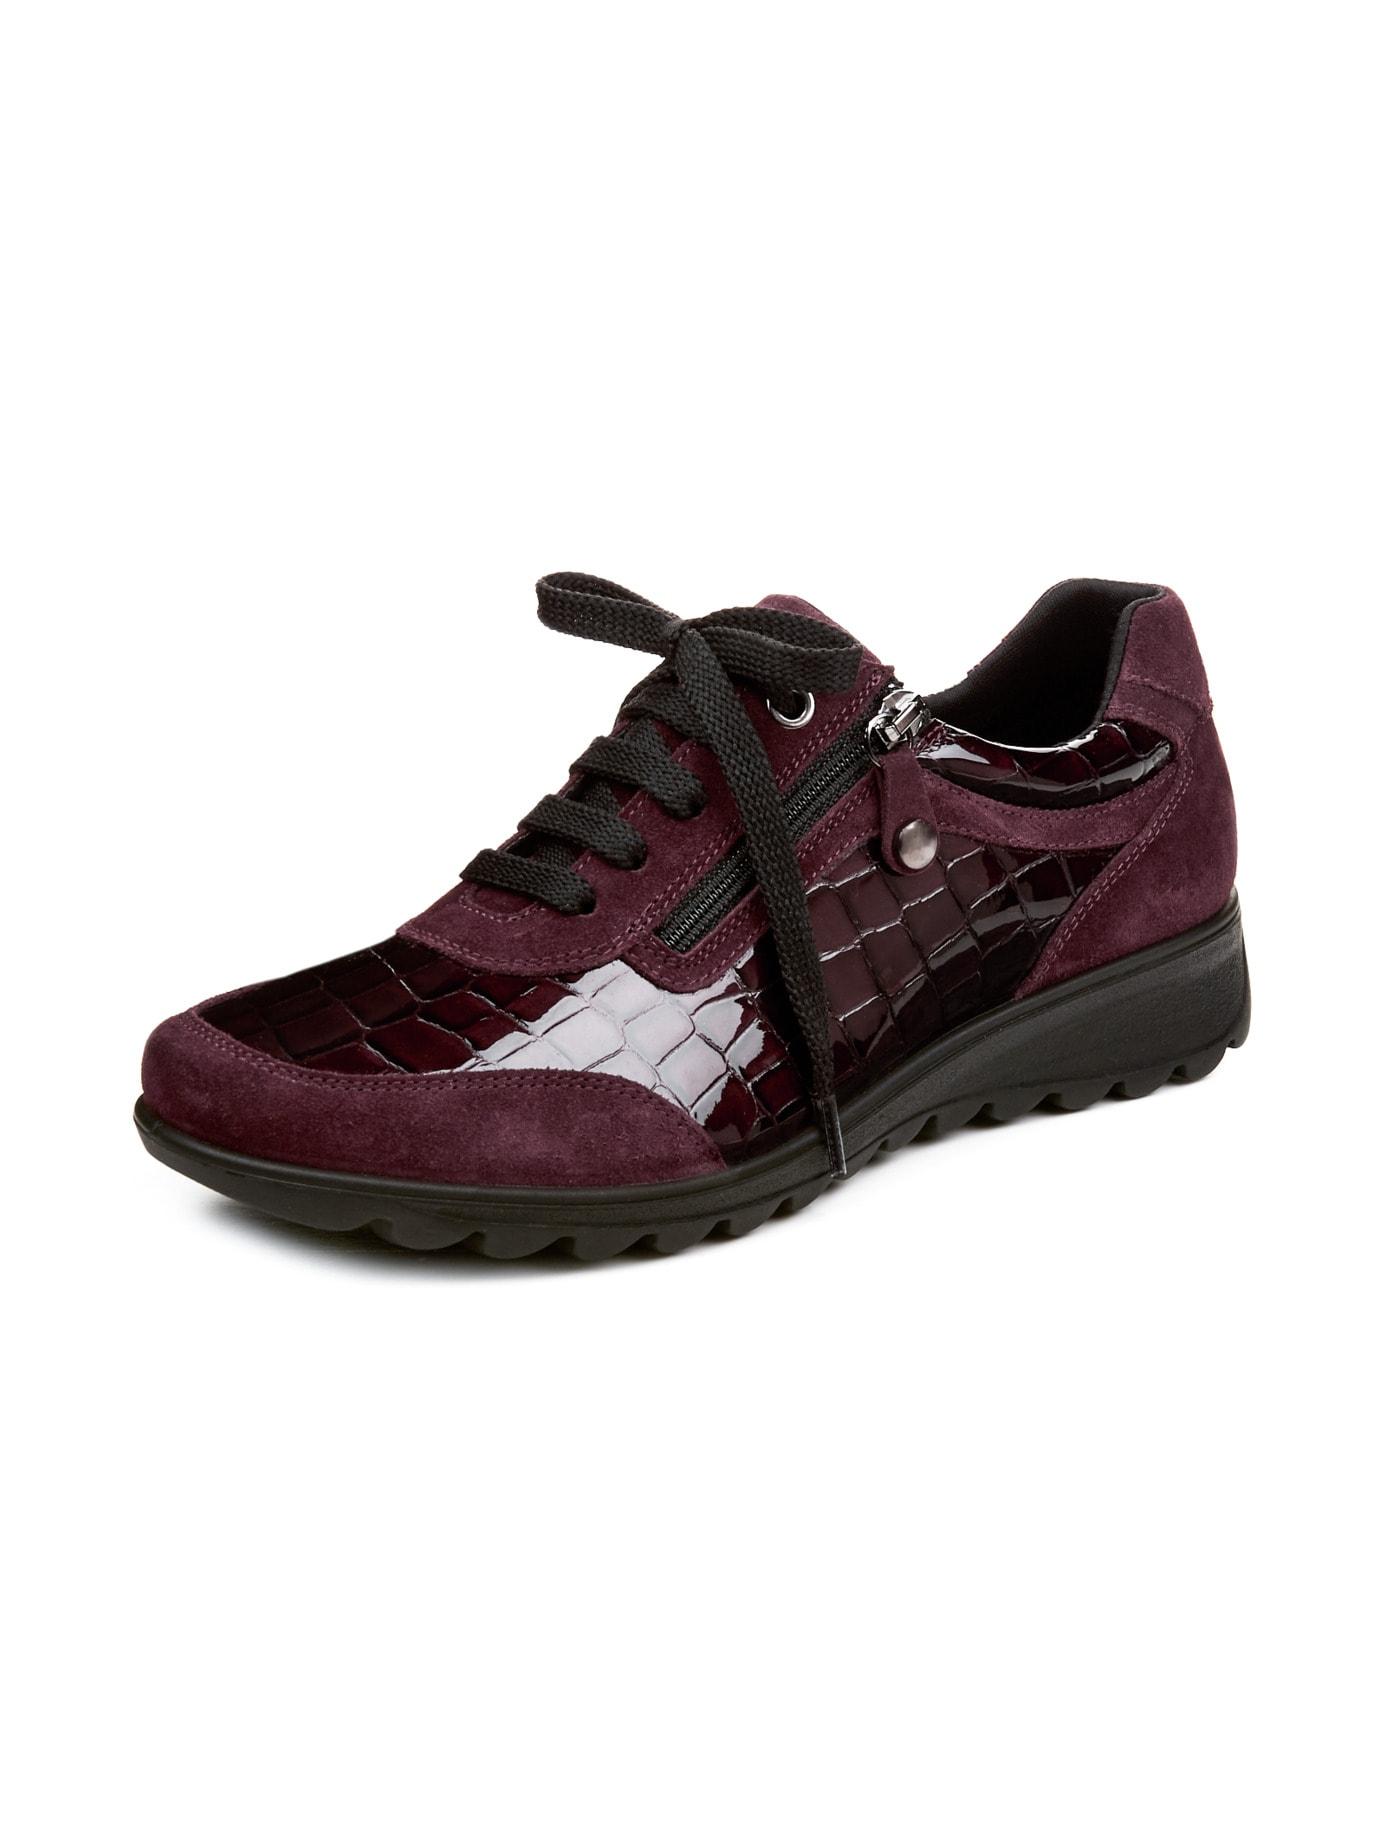 Avena Damen Luftkissen-Sneaker Rot 45-8490-4